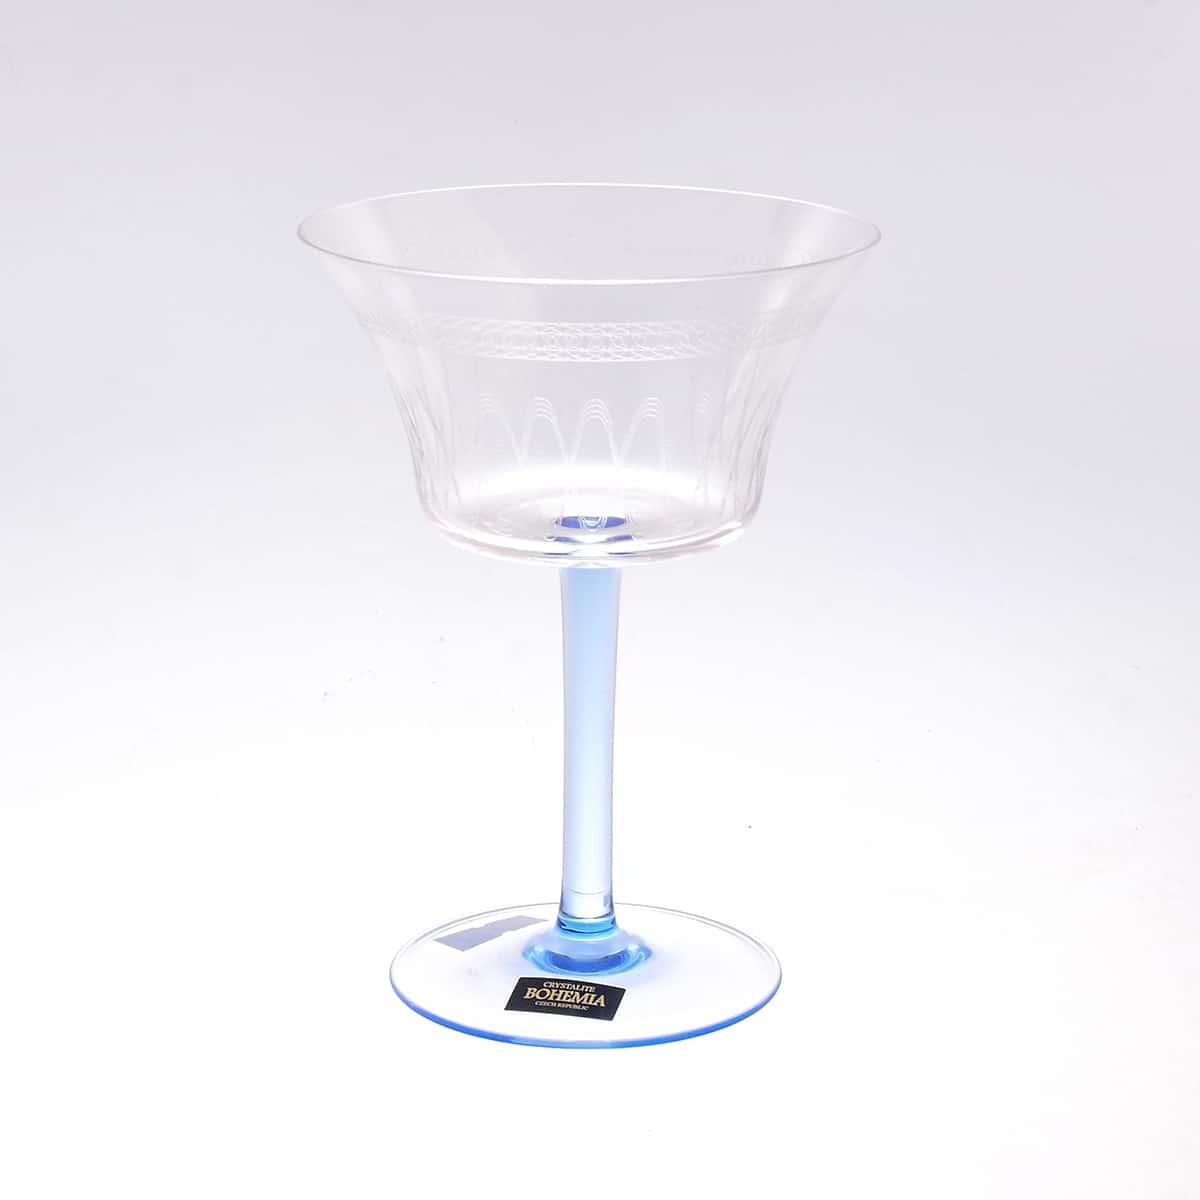 ANNABELL 280560 Набор бокалов для вина 200 мл Crystalite (6 шт)